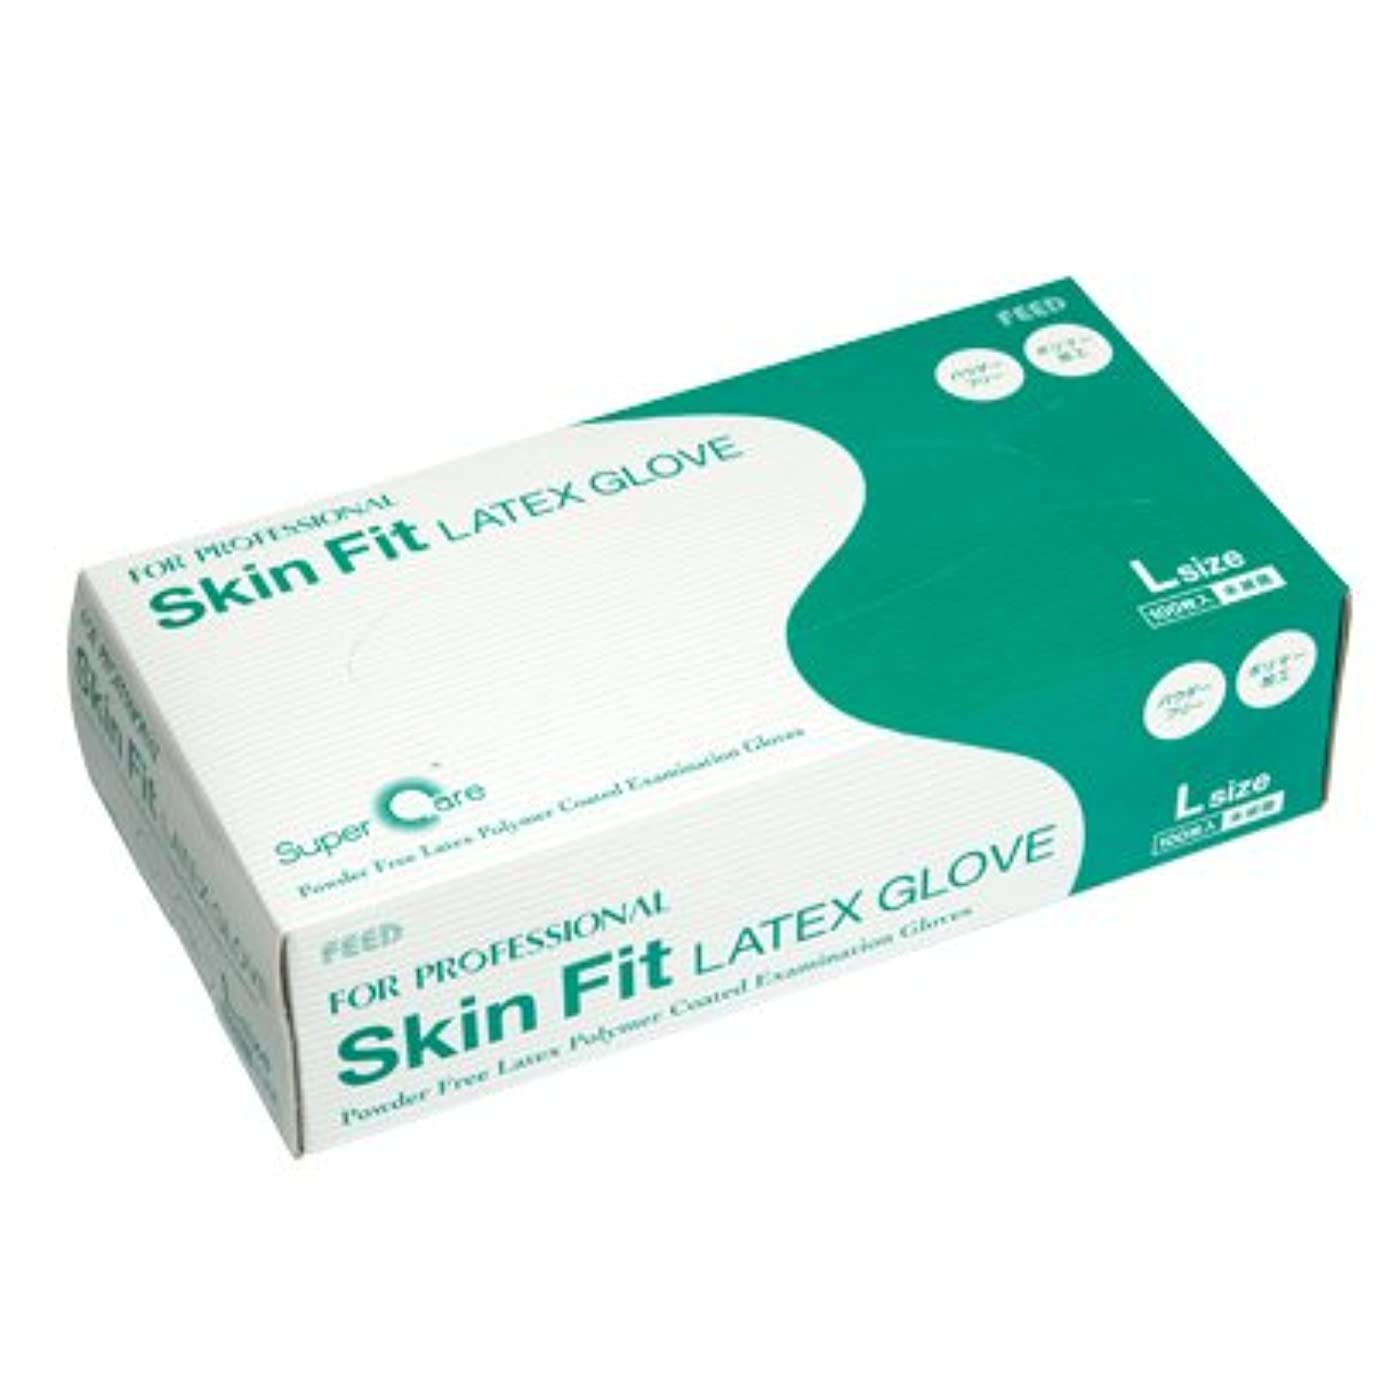 FEED(フィード) Skin Fit ラテックスグローブ パウダーフリー ポリマー加工 L カートン(100枚入×10ケース) (医療機器)